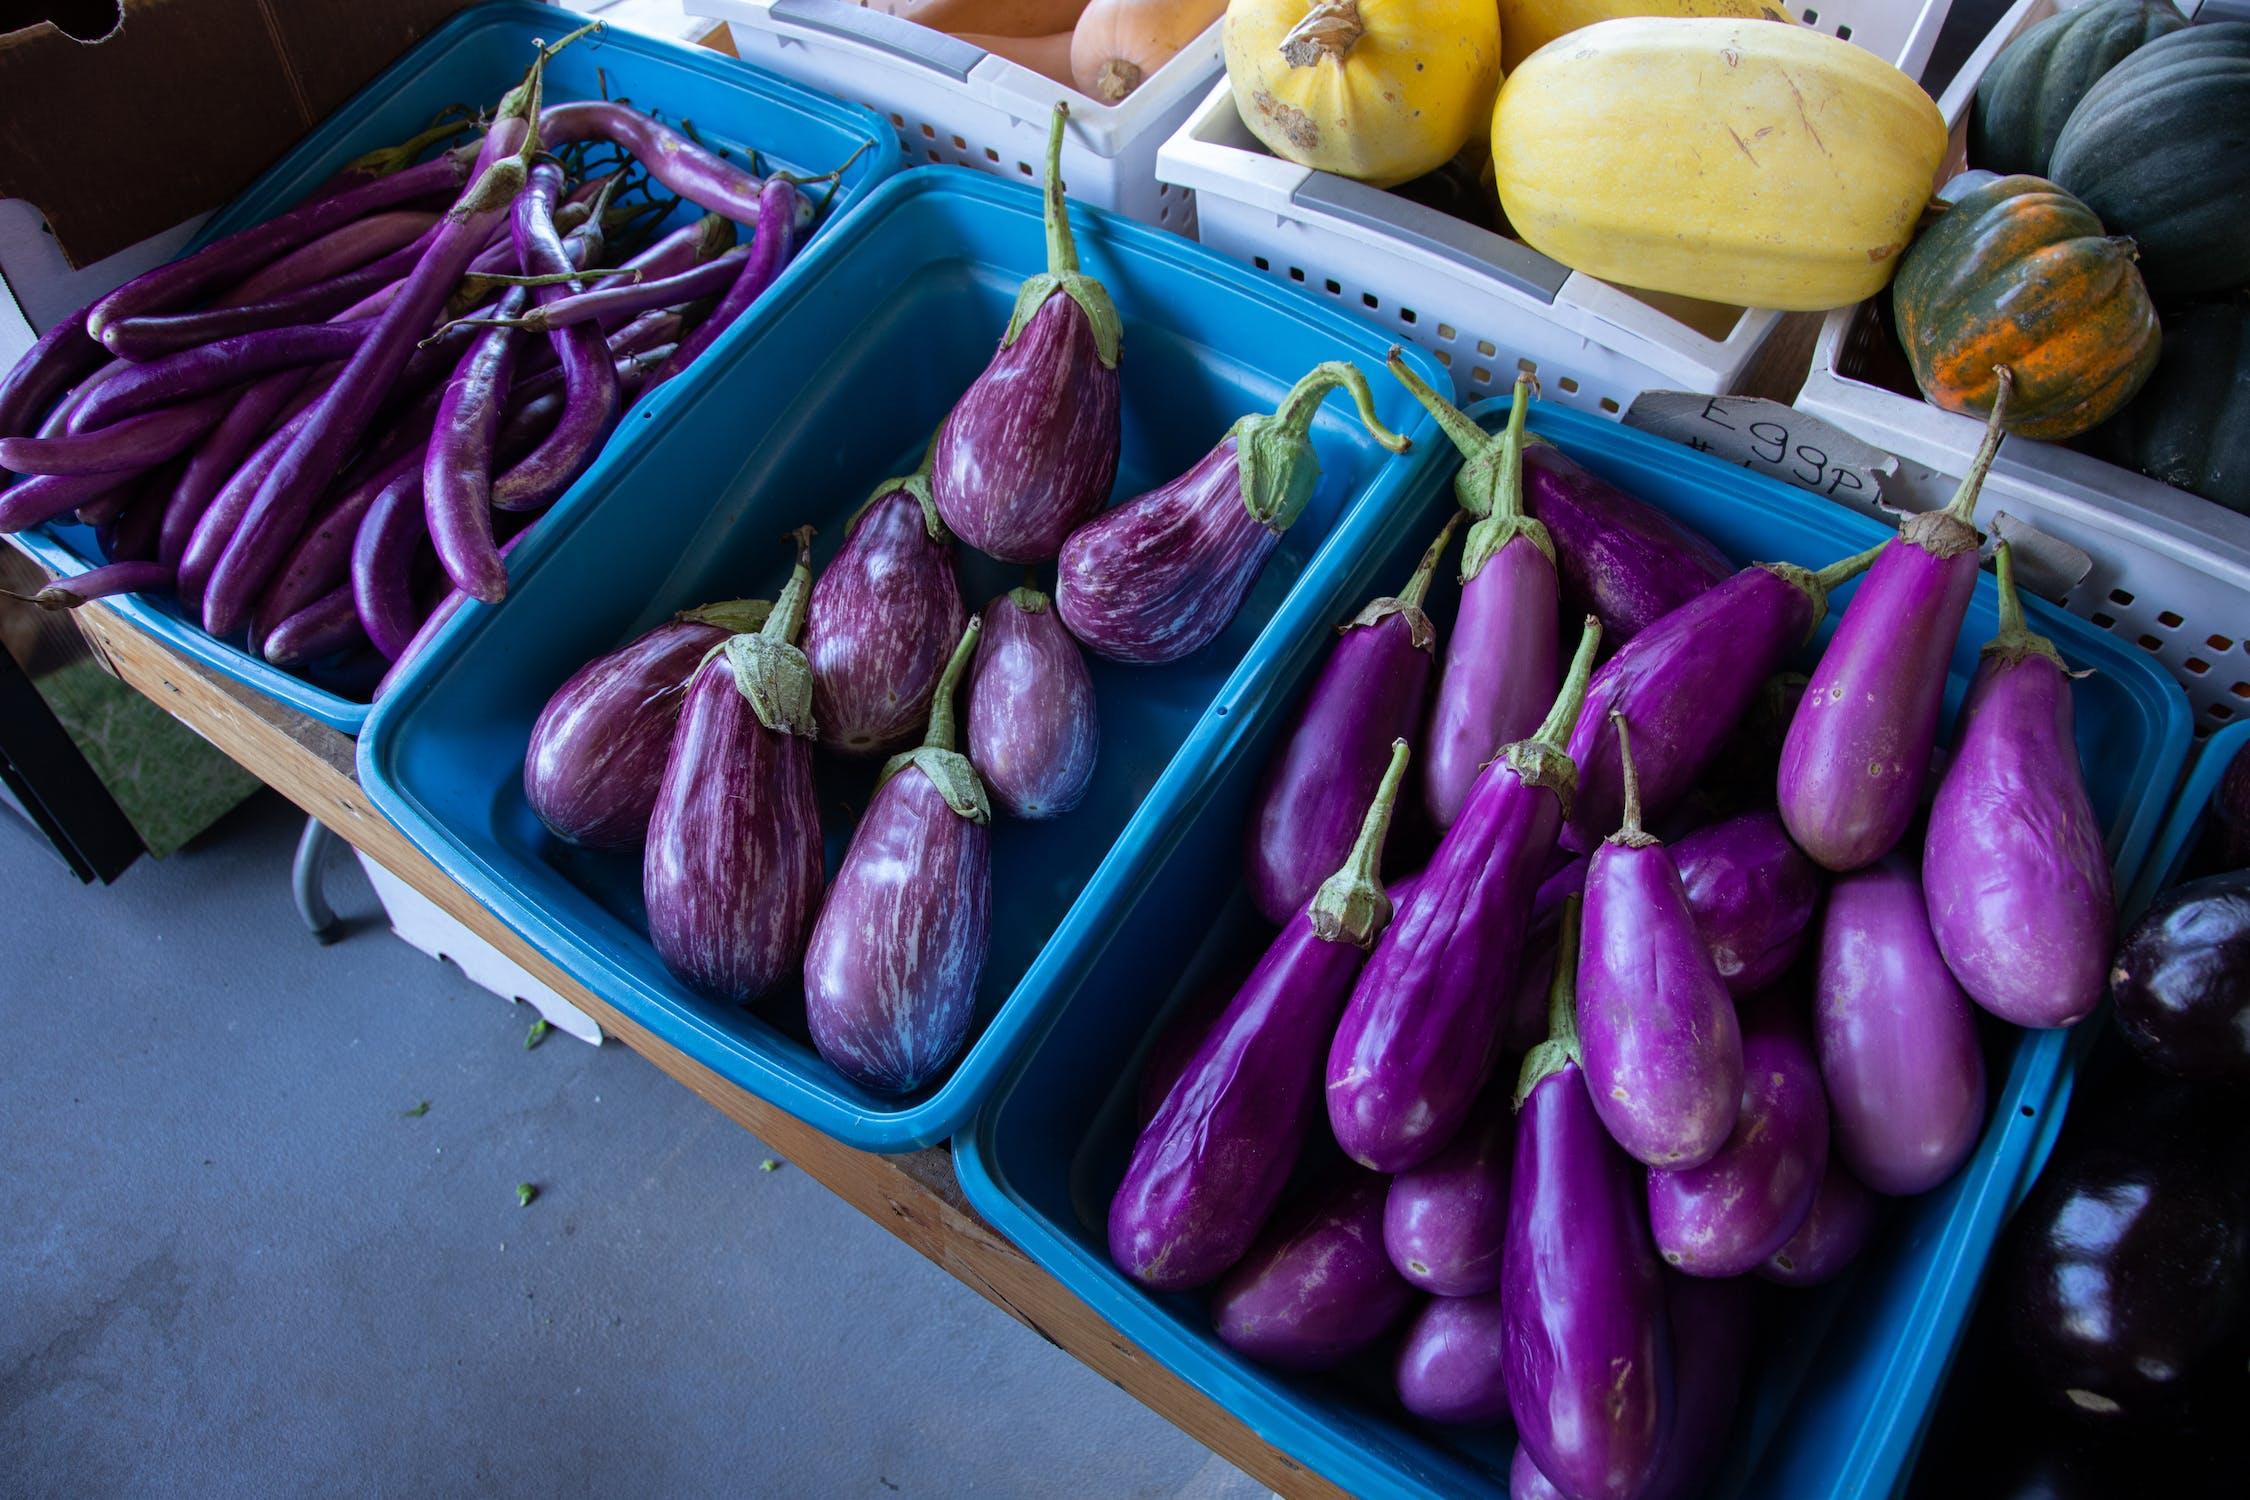 Brinjal / Eggplant Photo by Mark Stebnicki from Pexels